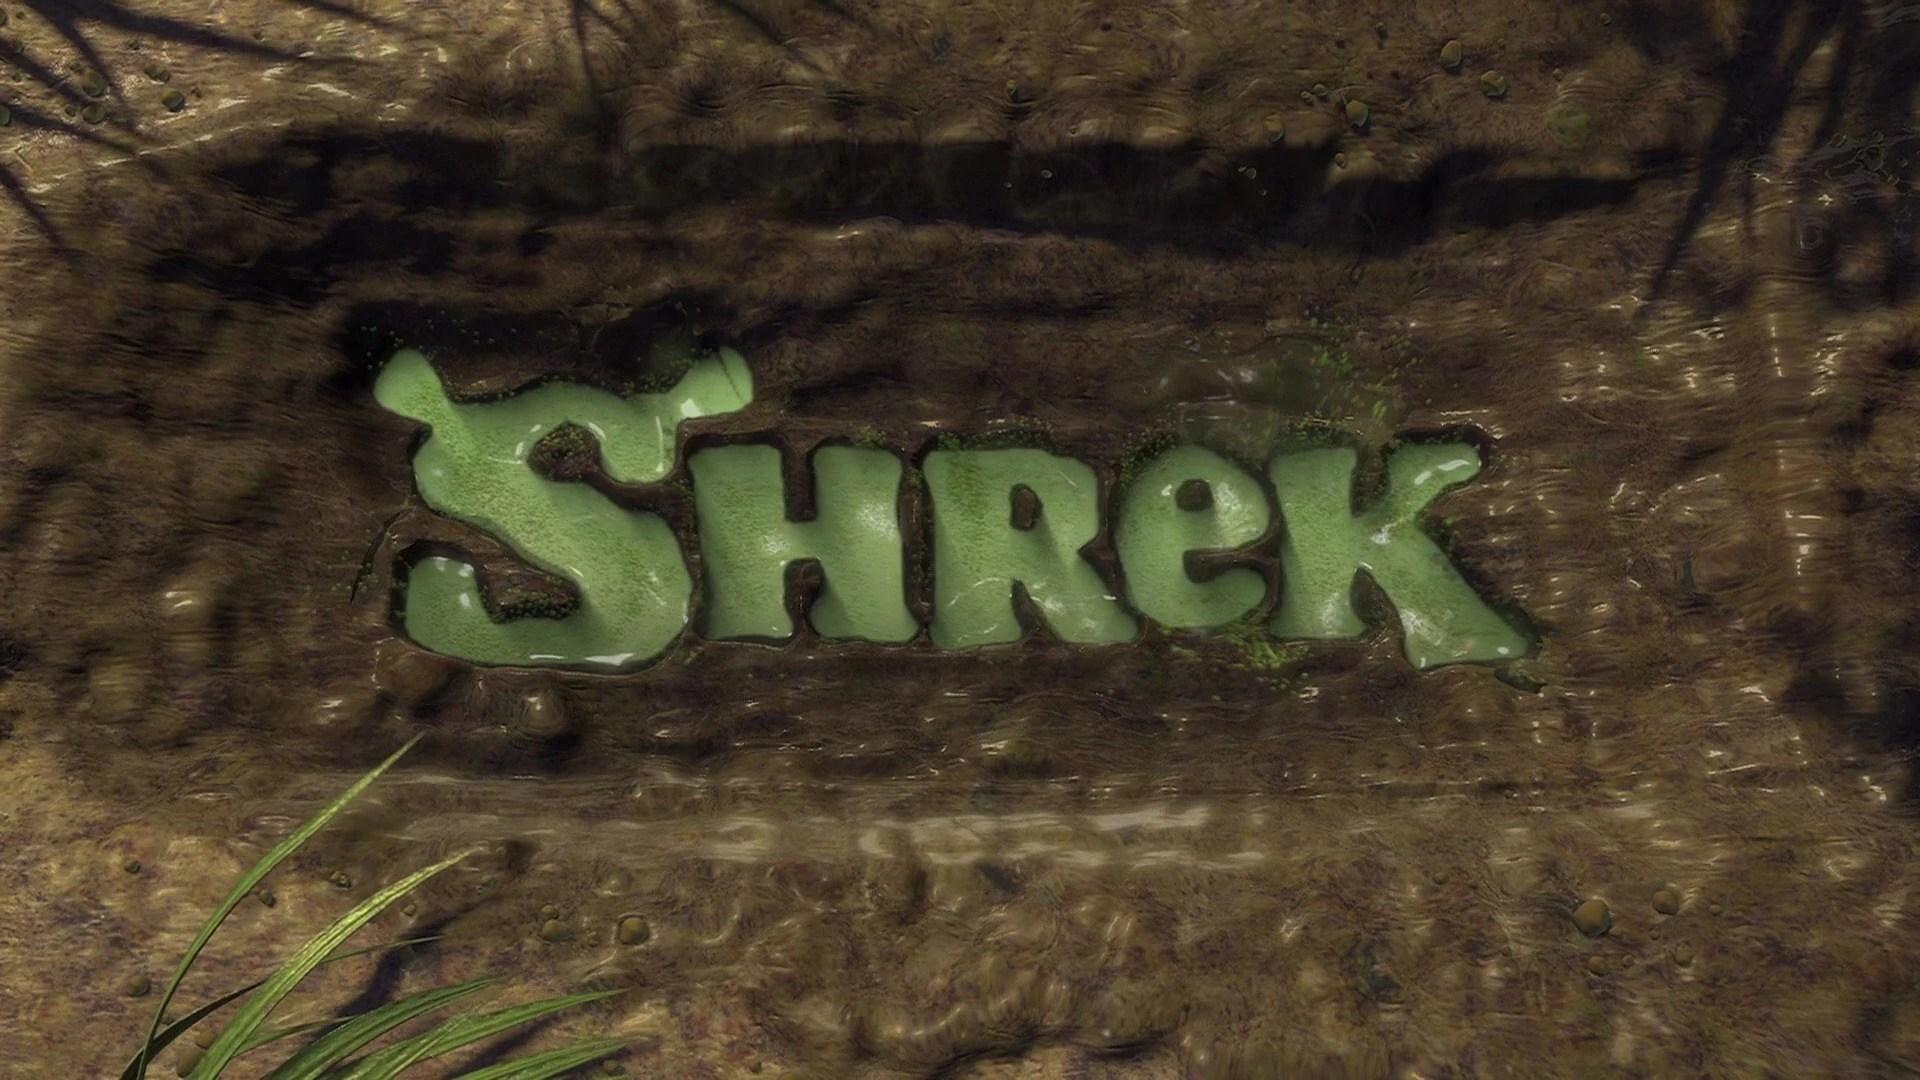 Third Shrek Disney Screencaps